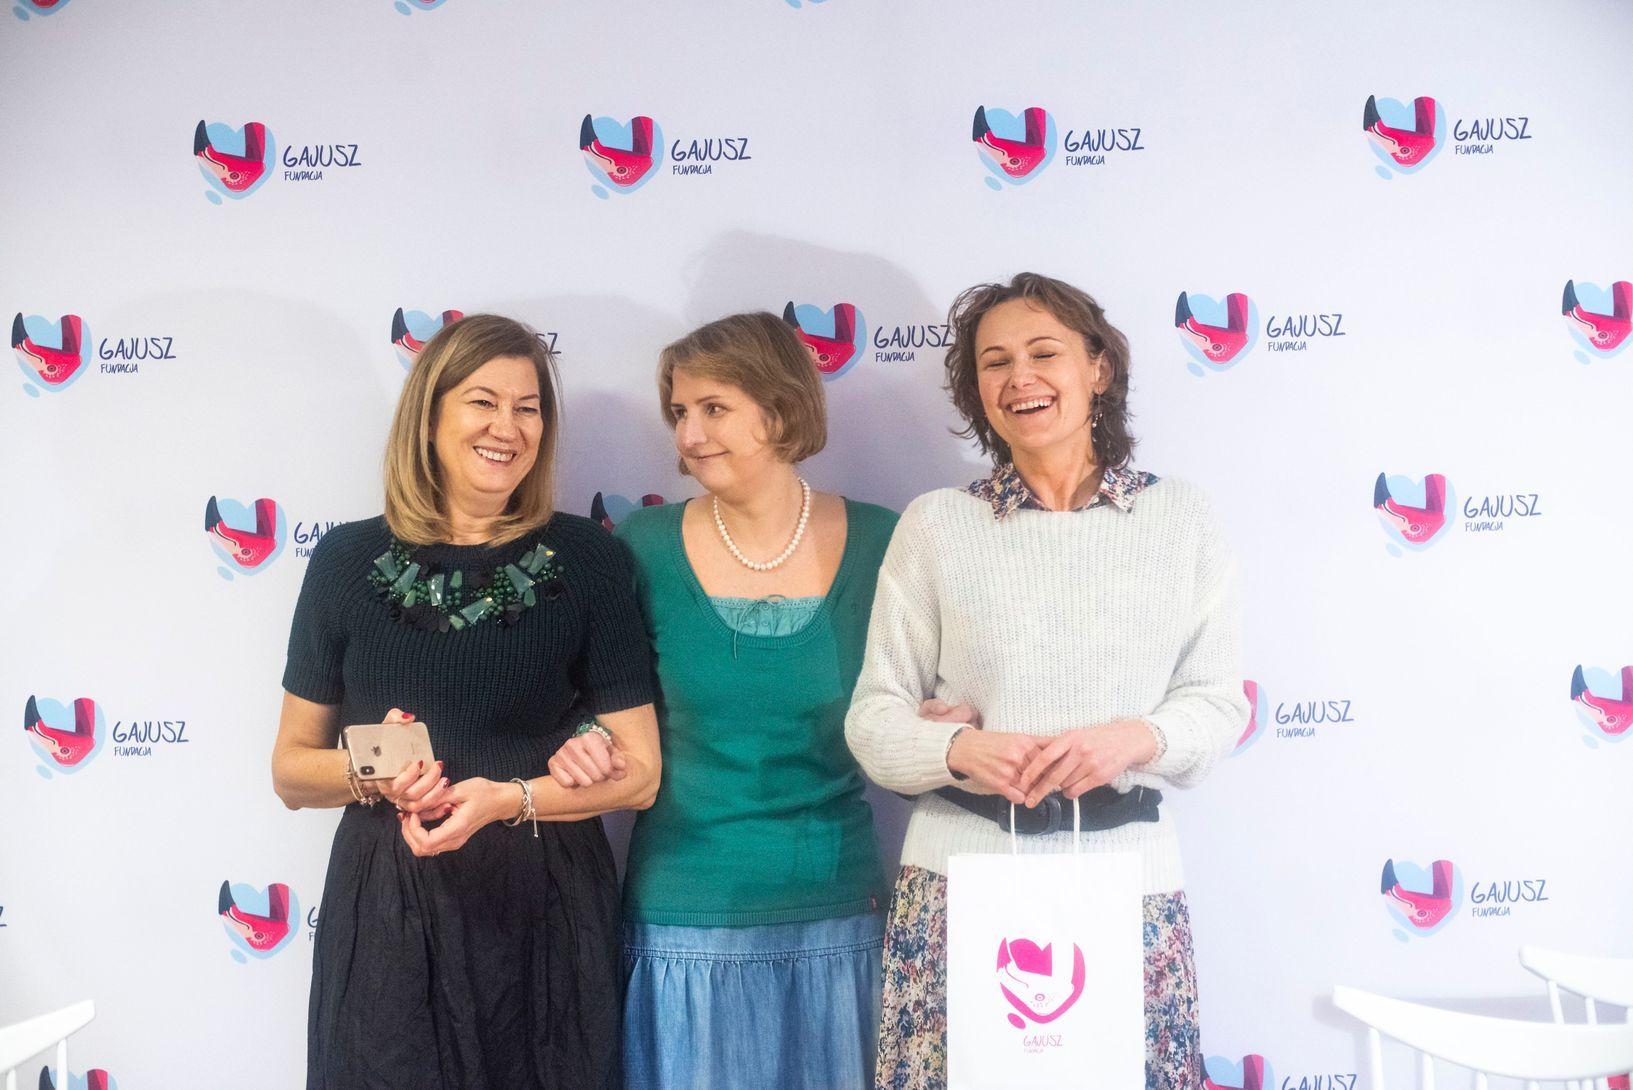 Od lewej: Anna Piekutowska, Tisa Żawrocka-Kwiatkowska, Anna Rajska-Rutkowska